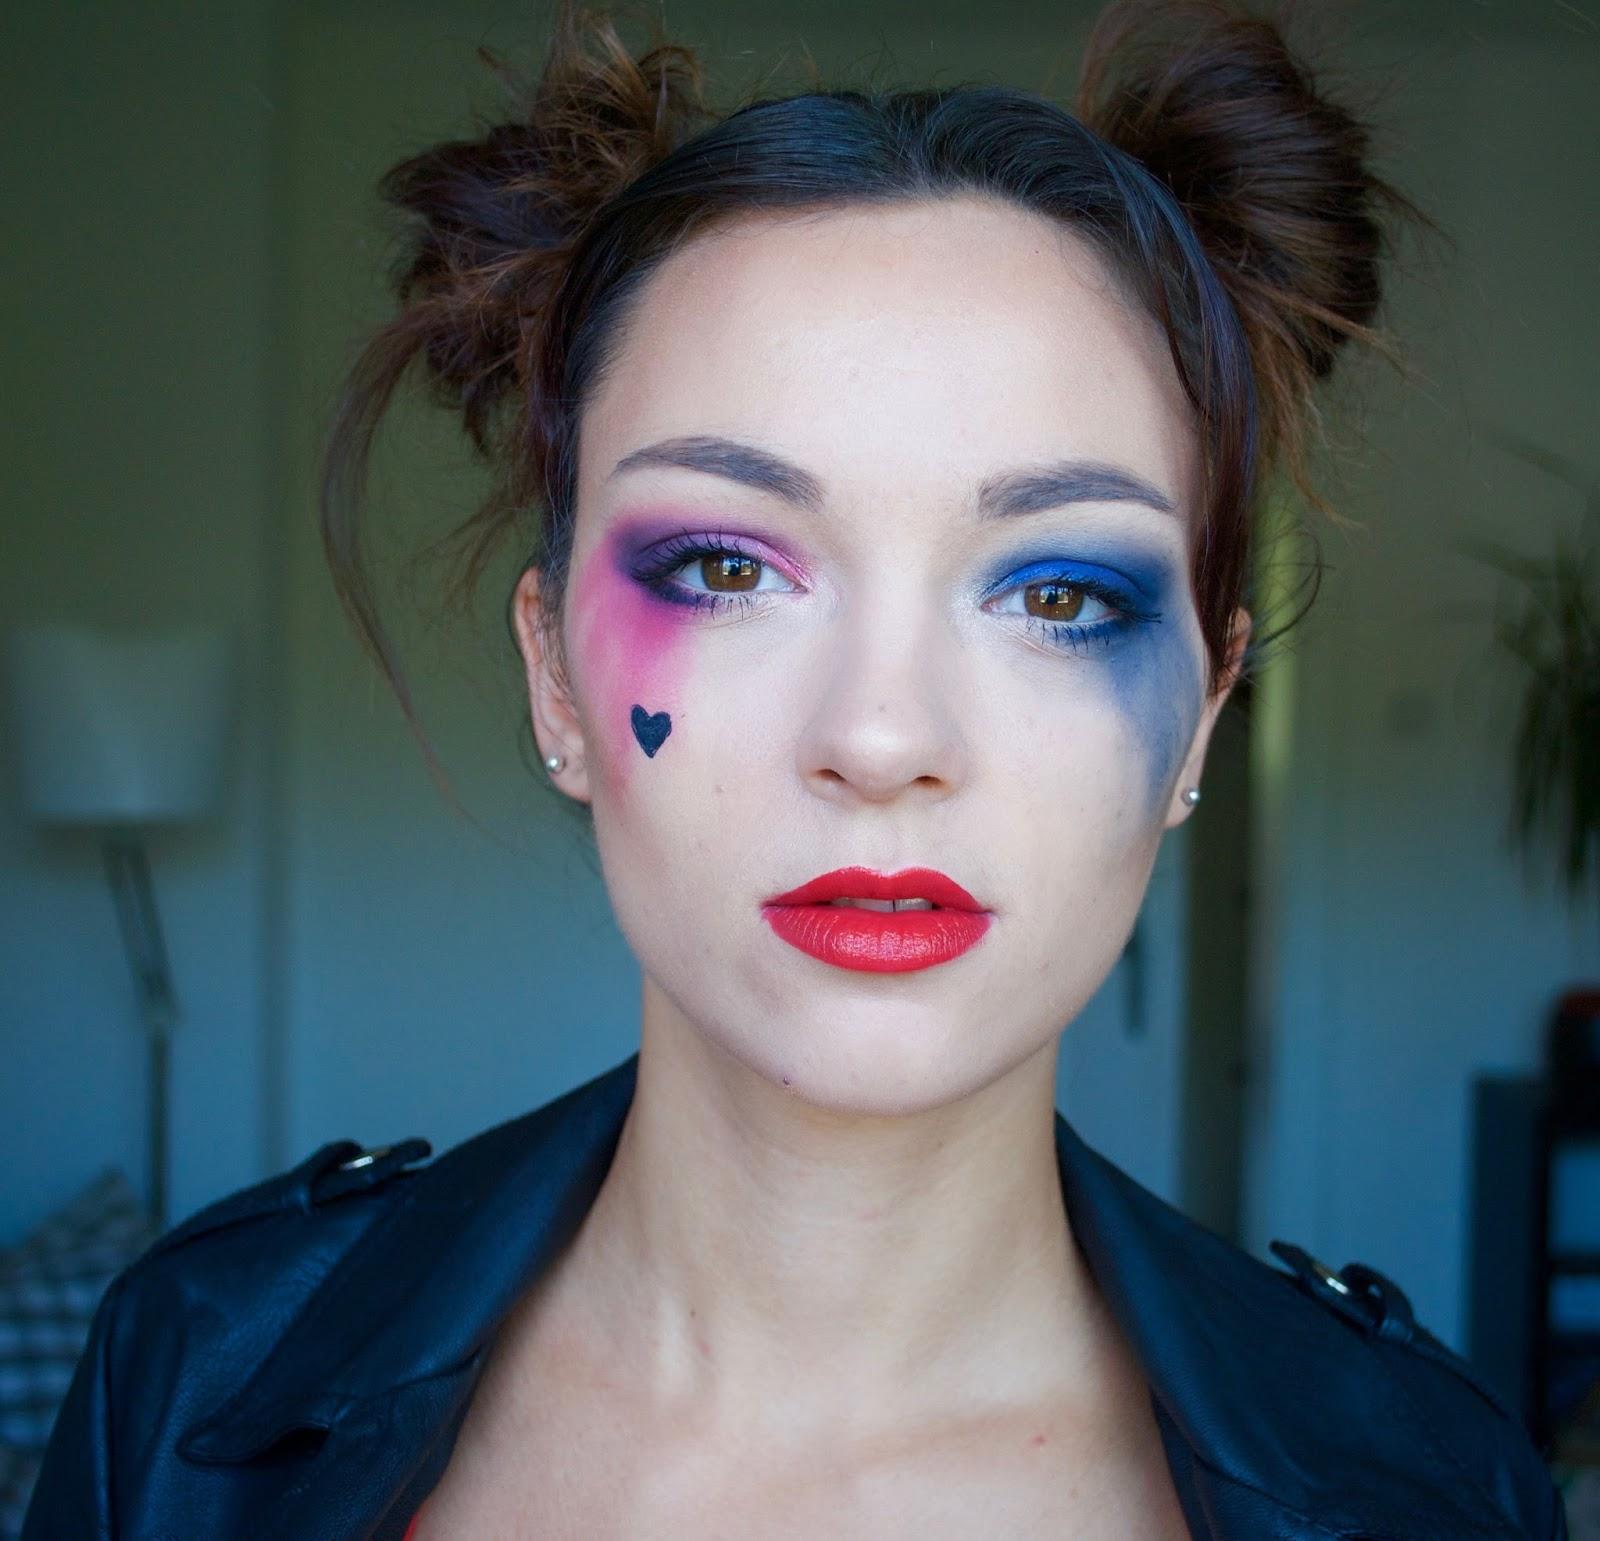 halloween makeup harley quinn adel channel youtube. Black Bedroom Furniture Sets. Home Design Ideas